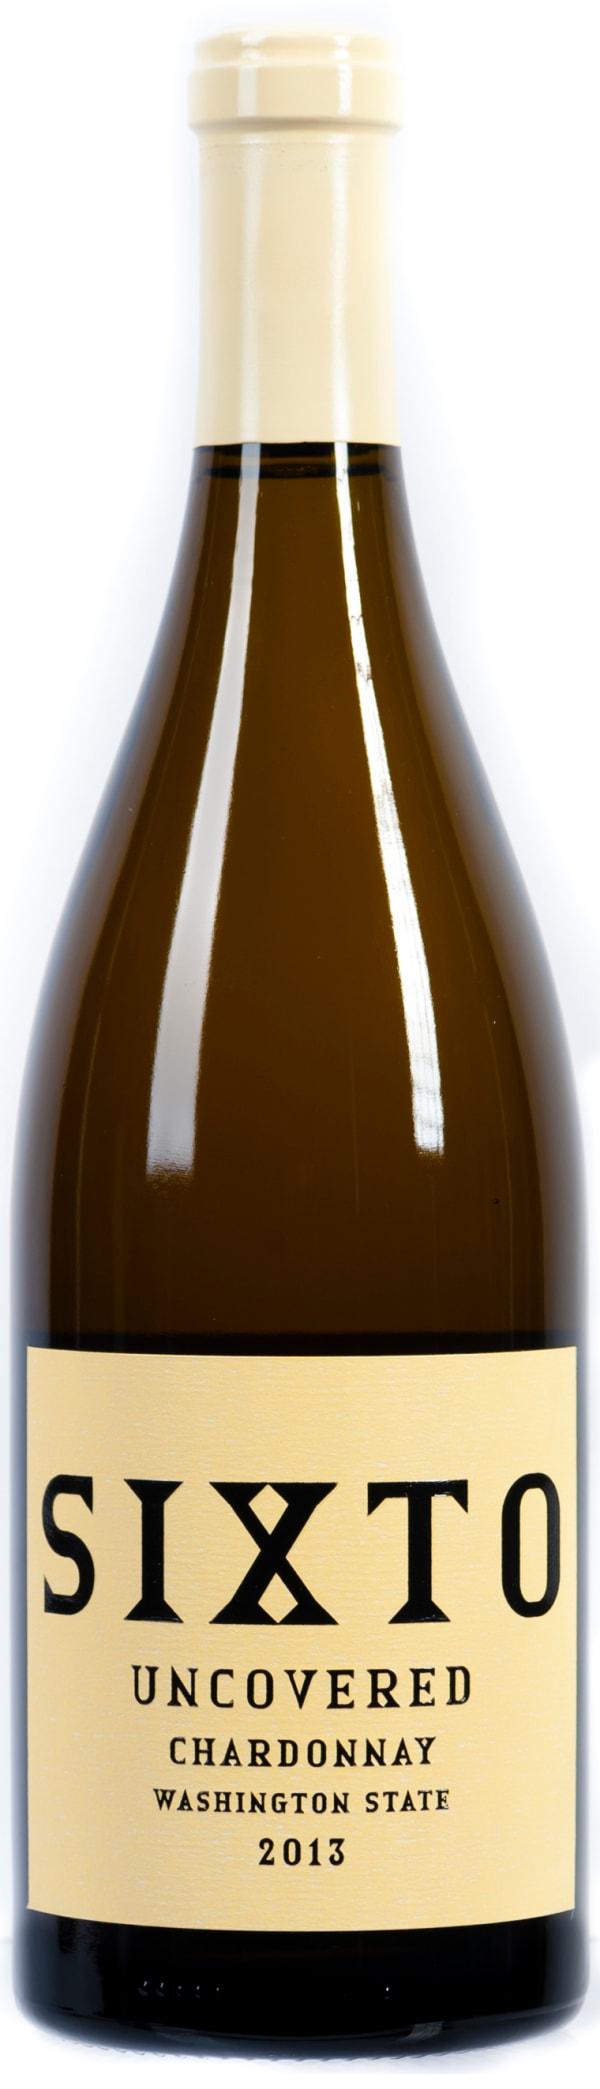 Sixto Uncovered Chardonnay 2015